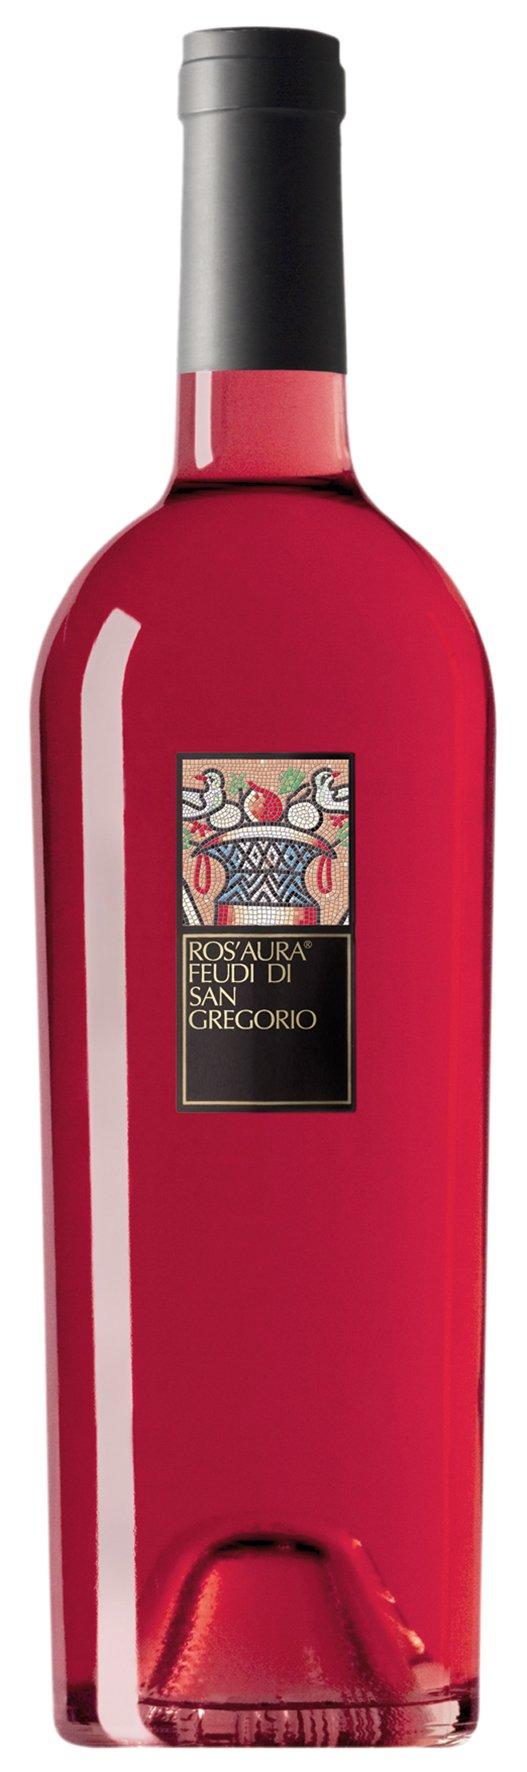 6x-075l-2017er-Feudi-di-San-Gregorio-RosAura-Rosato-Irpinia-DOP-Kampanien-Italien-Ros-Wein-trocken